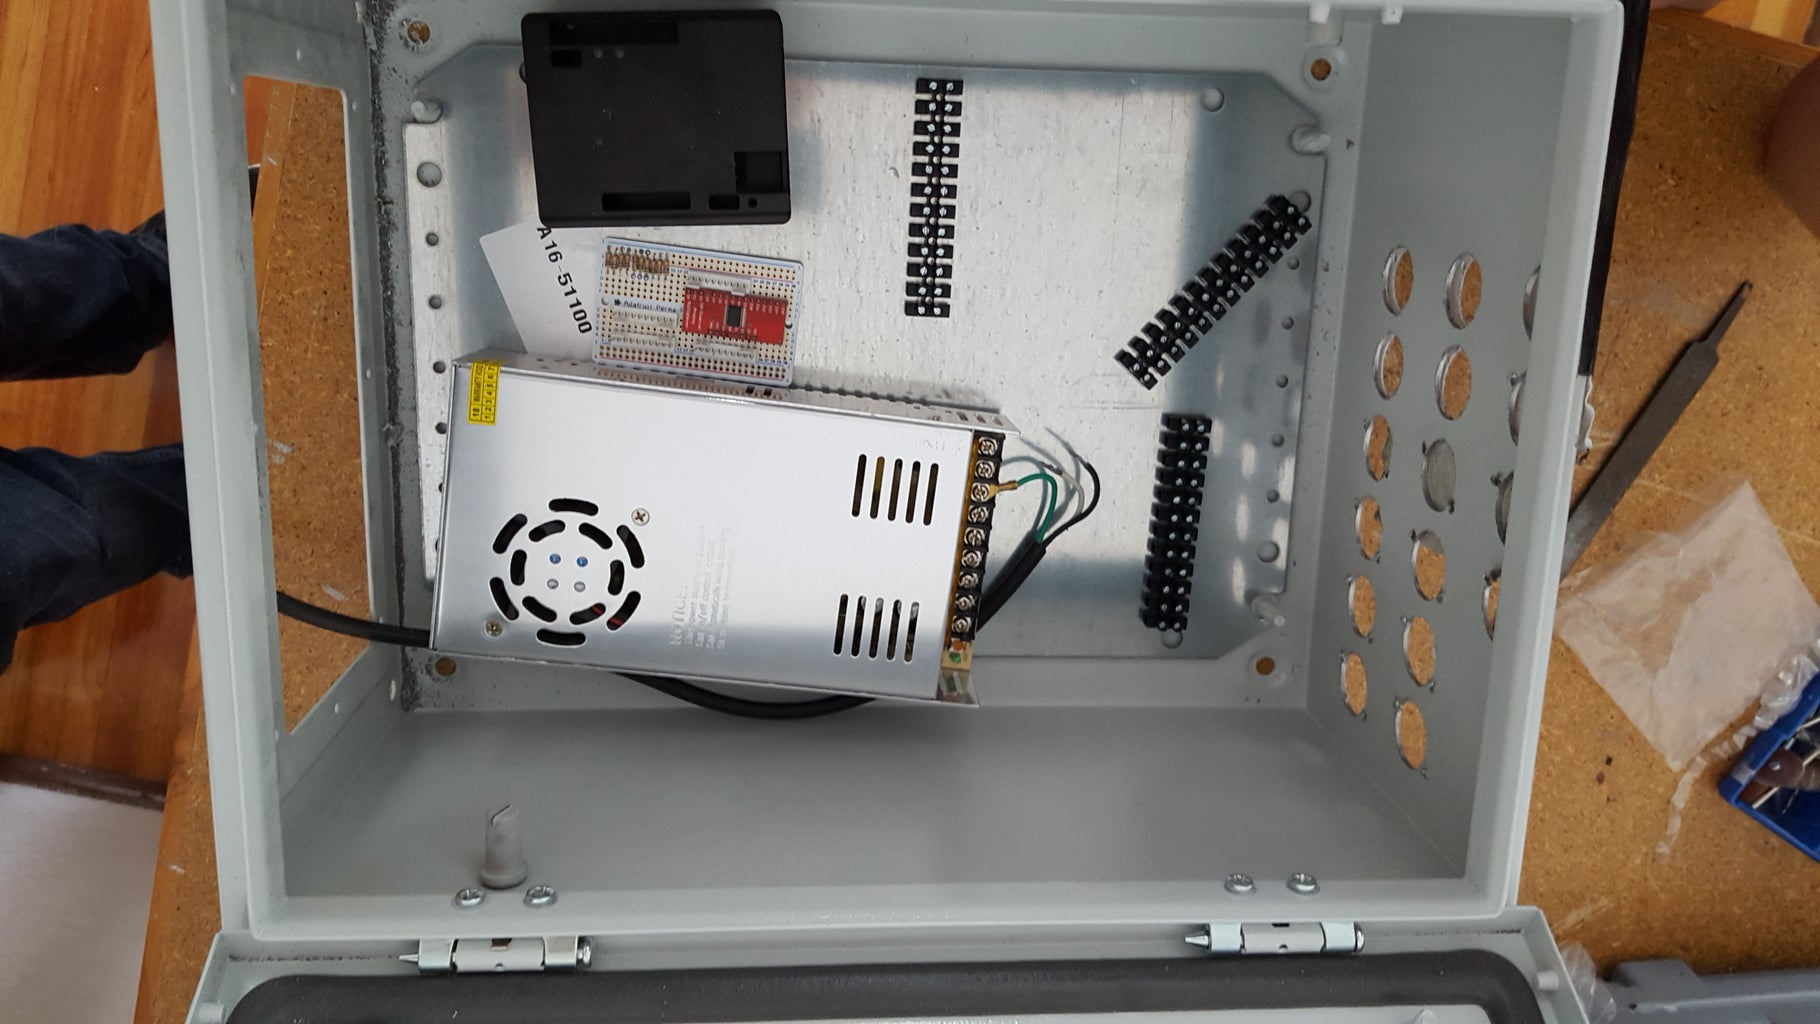 Preparing the Control Panel